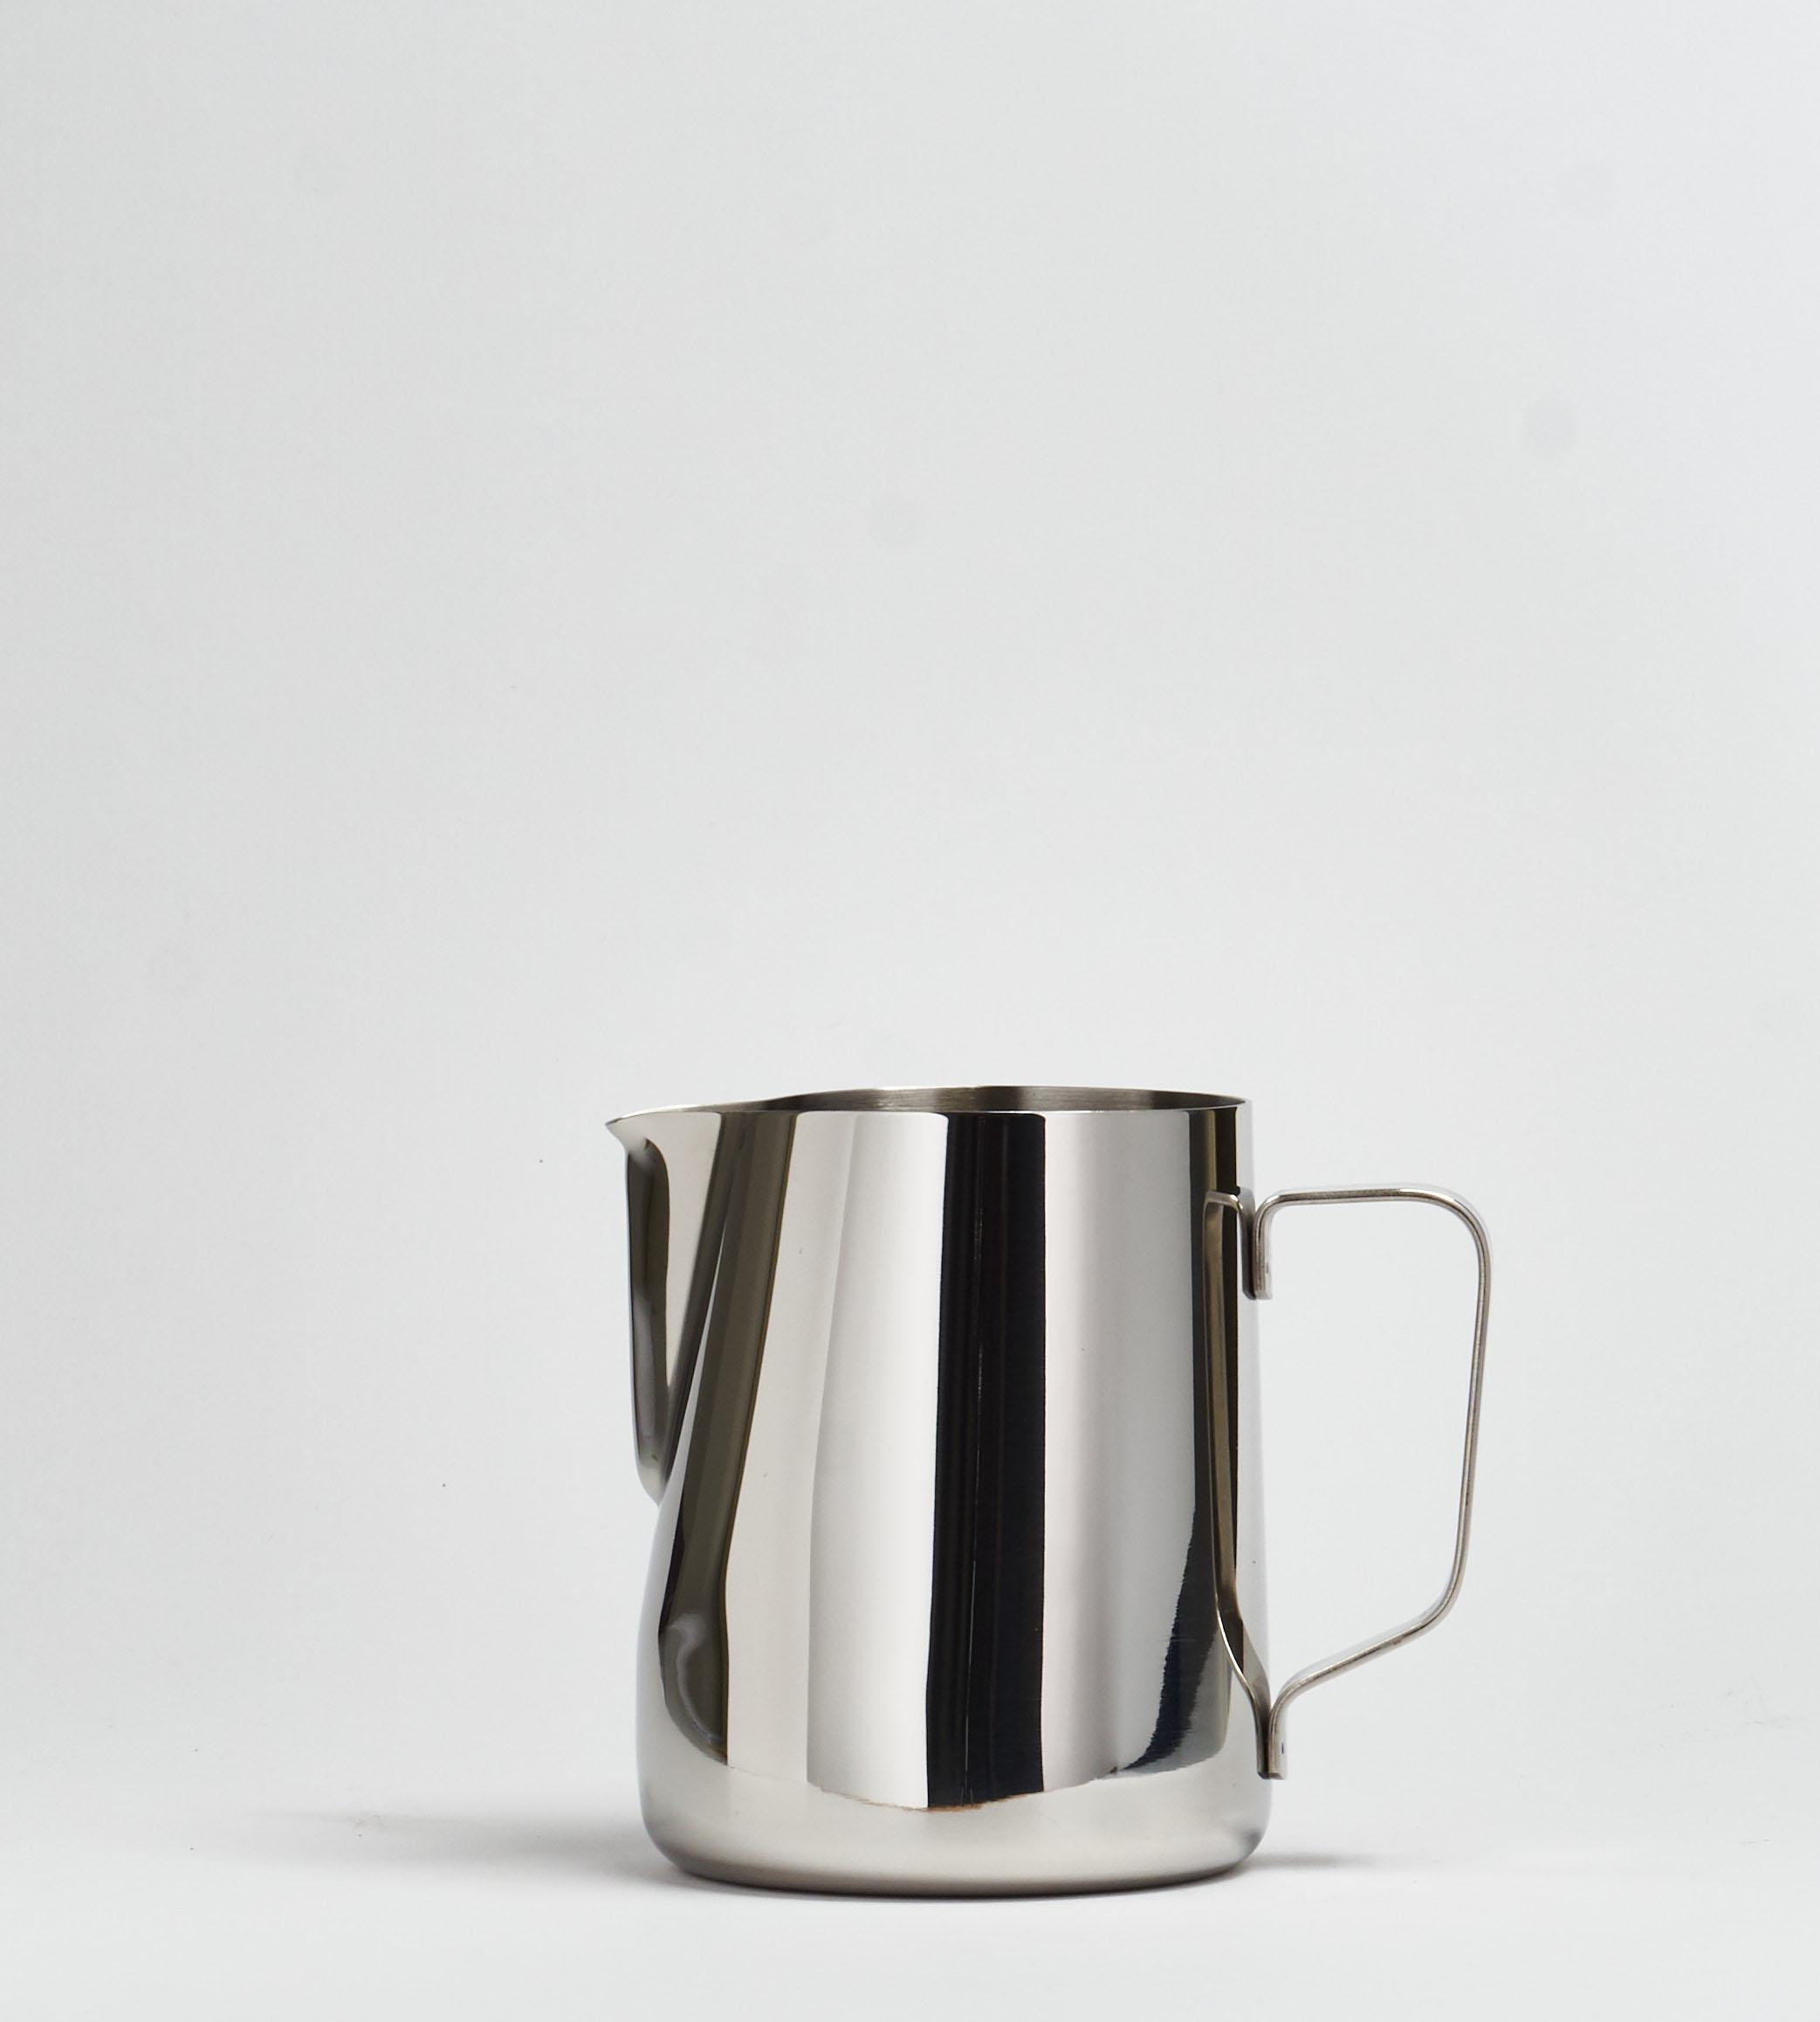 Milchkännchen Pro, Edelstahl-prev-1